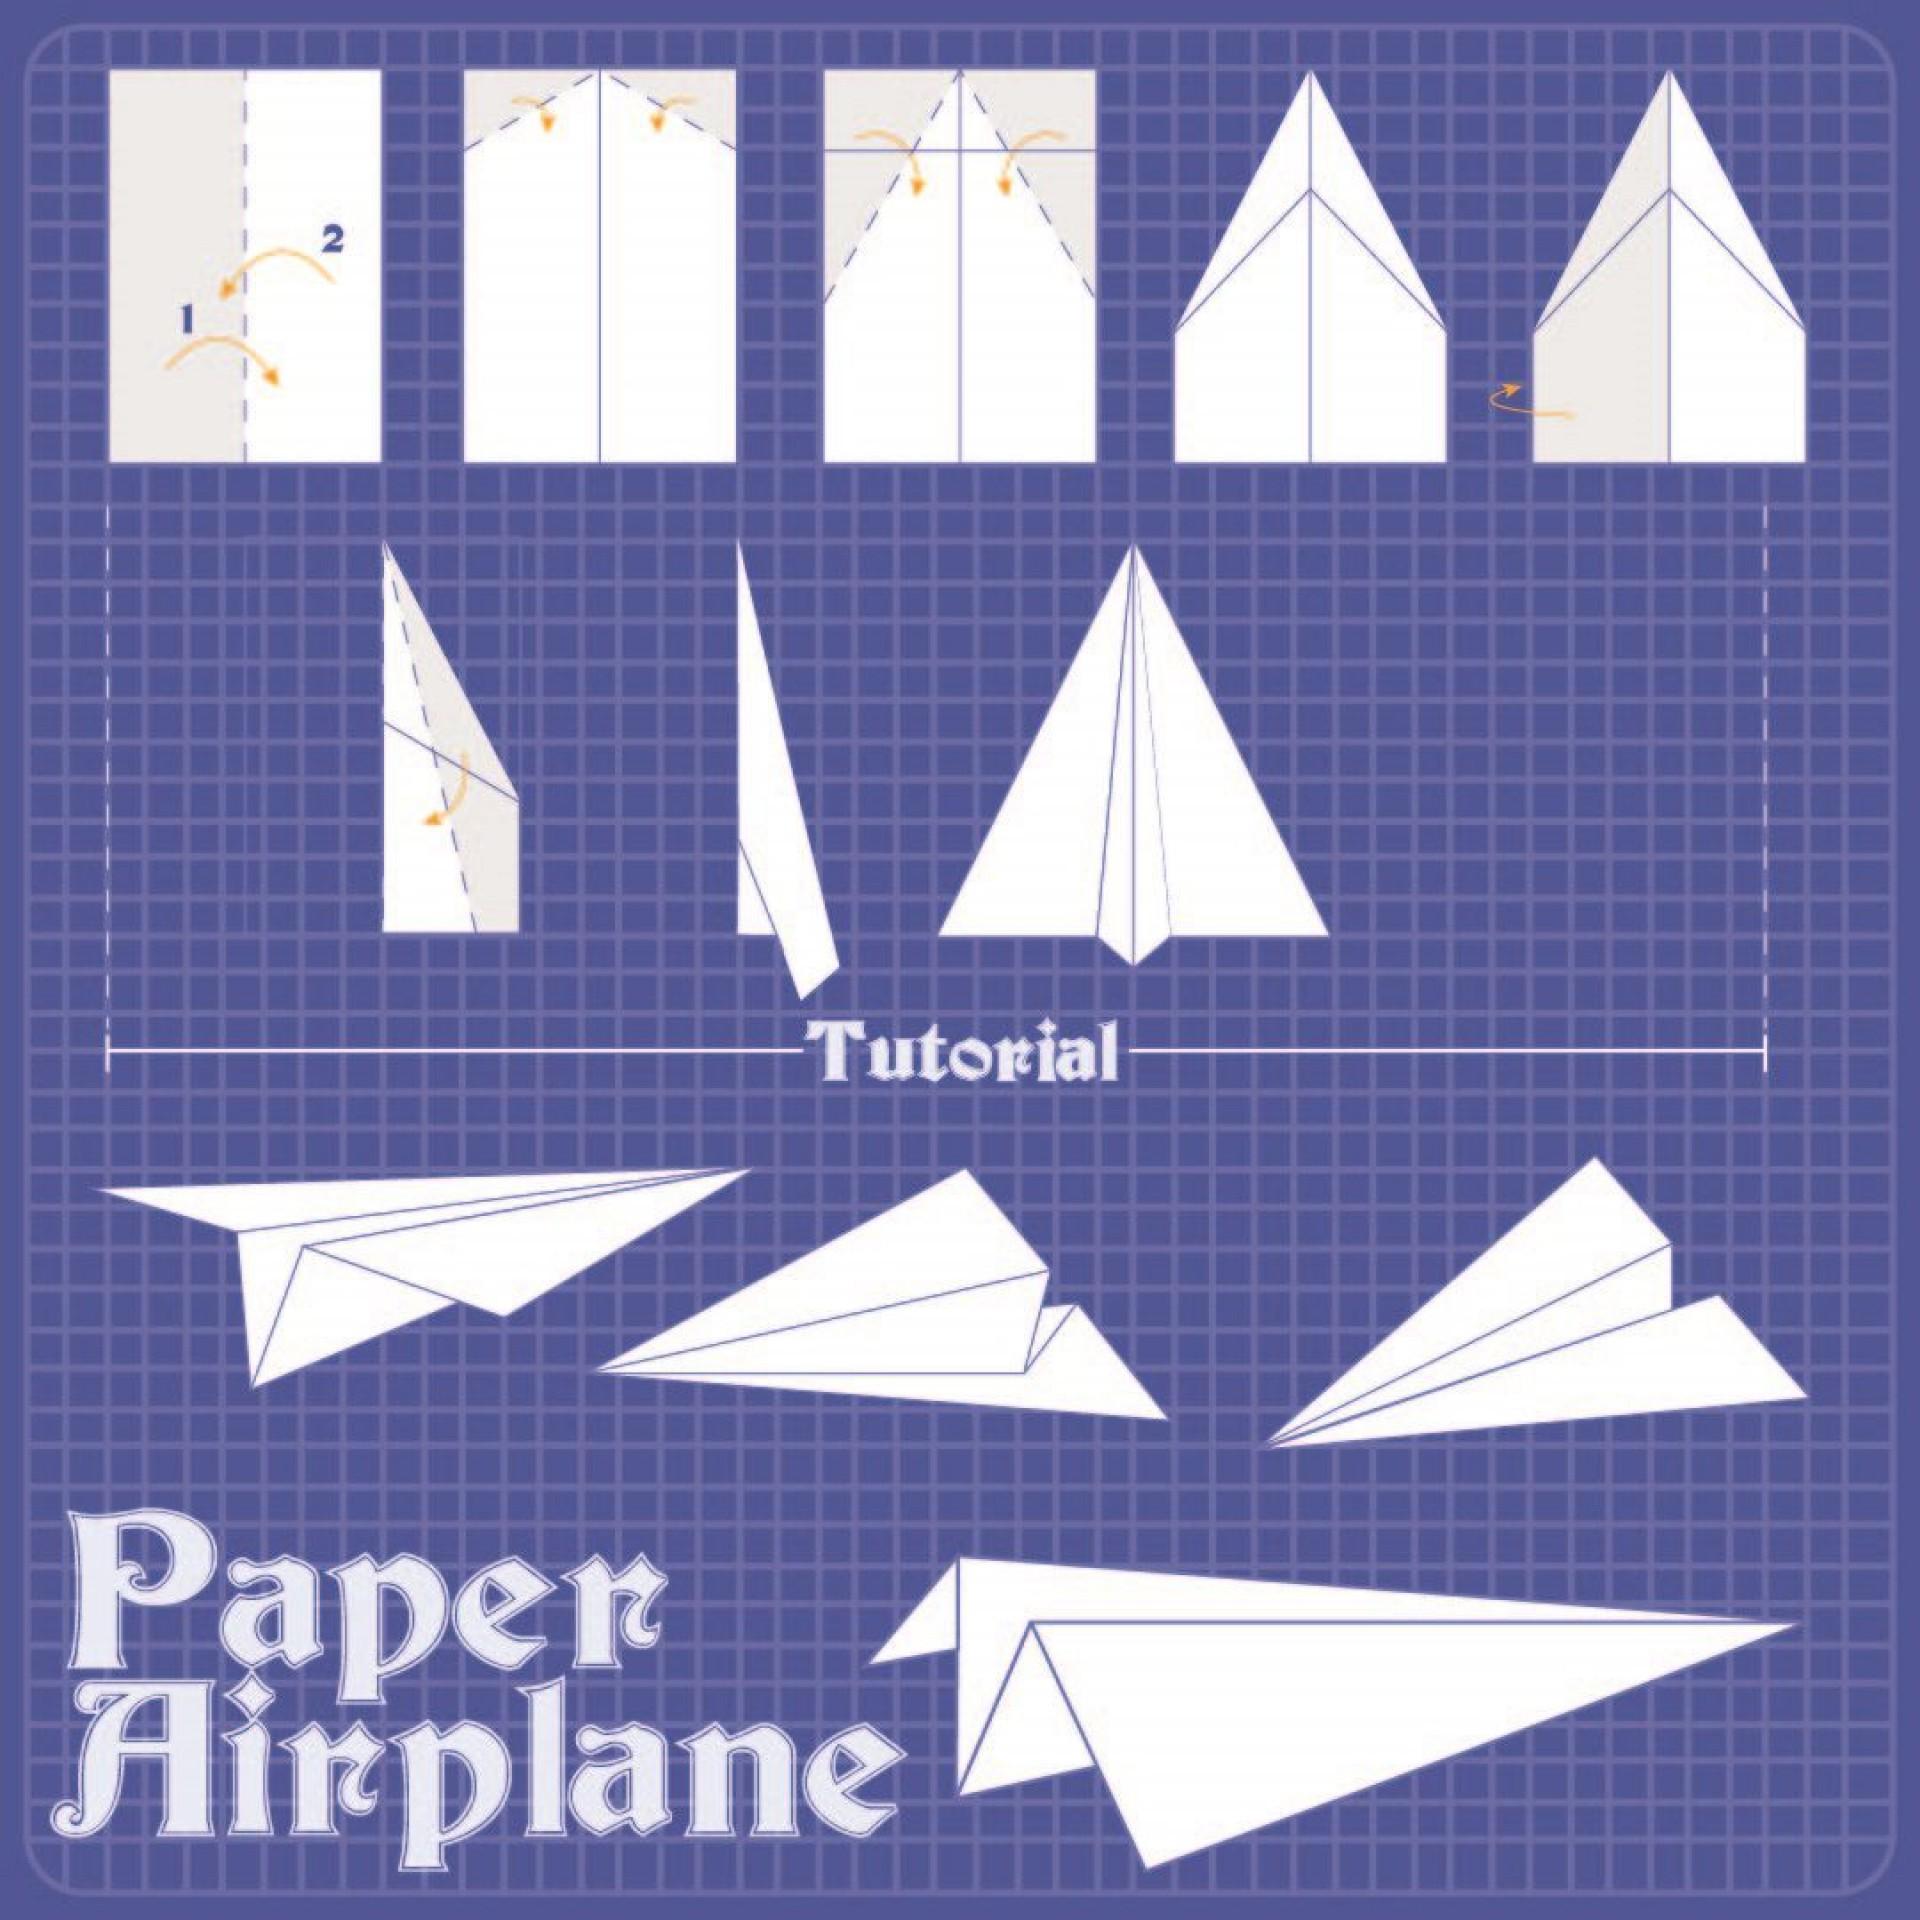 009 Magnificent Free Paper Airplane Design Printable Template Sample  Designs-printable Templates1920